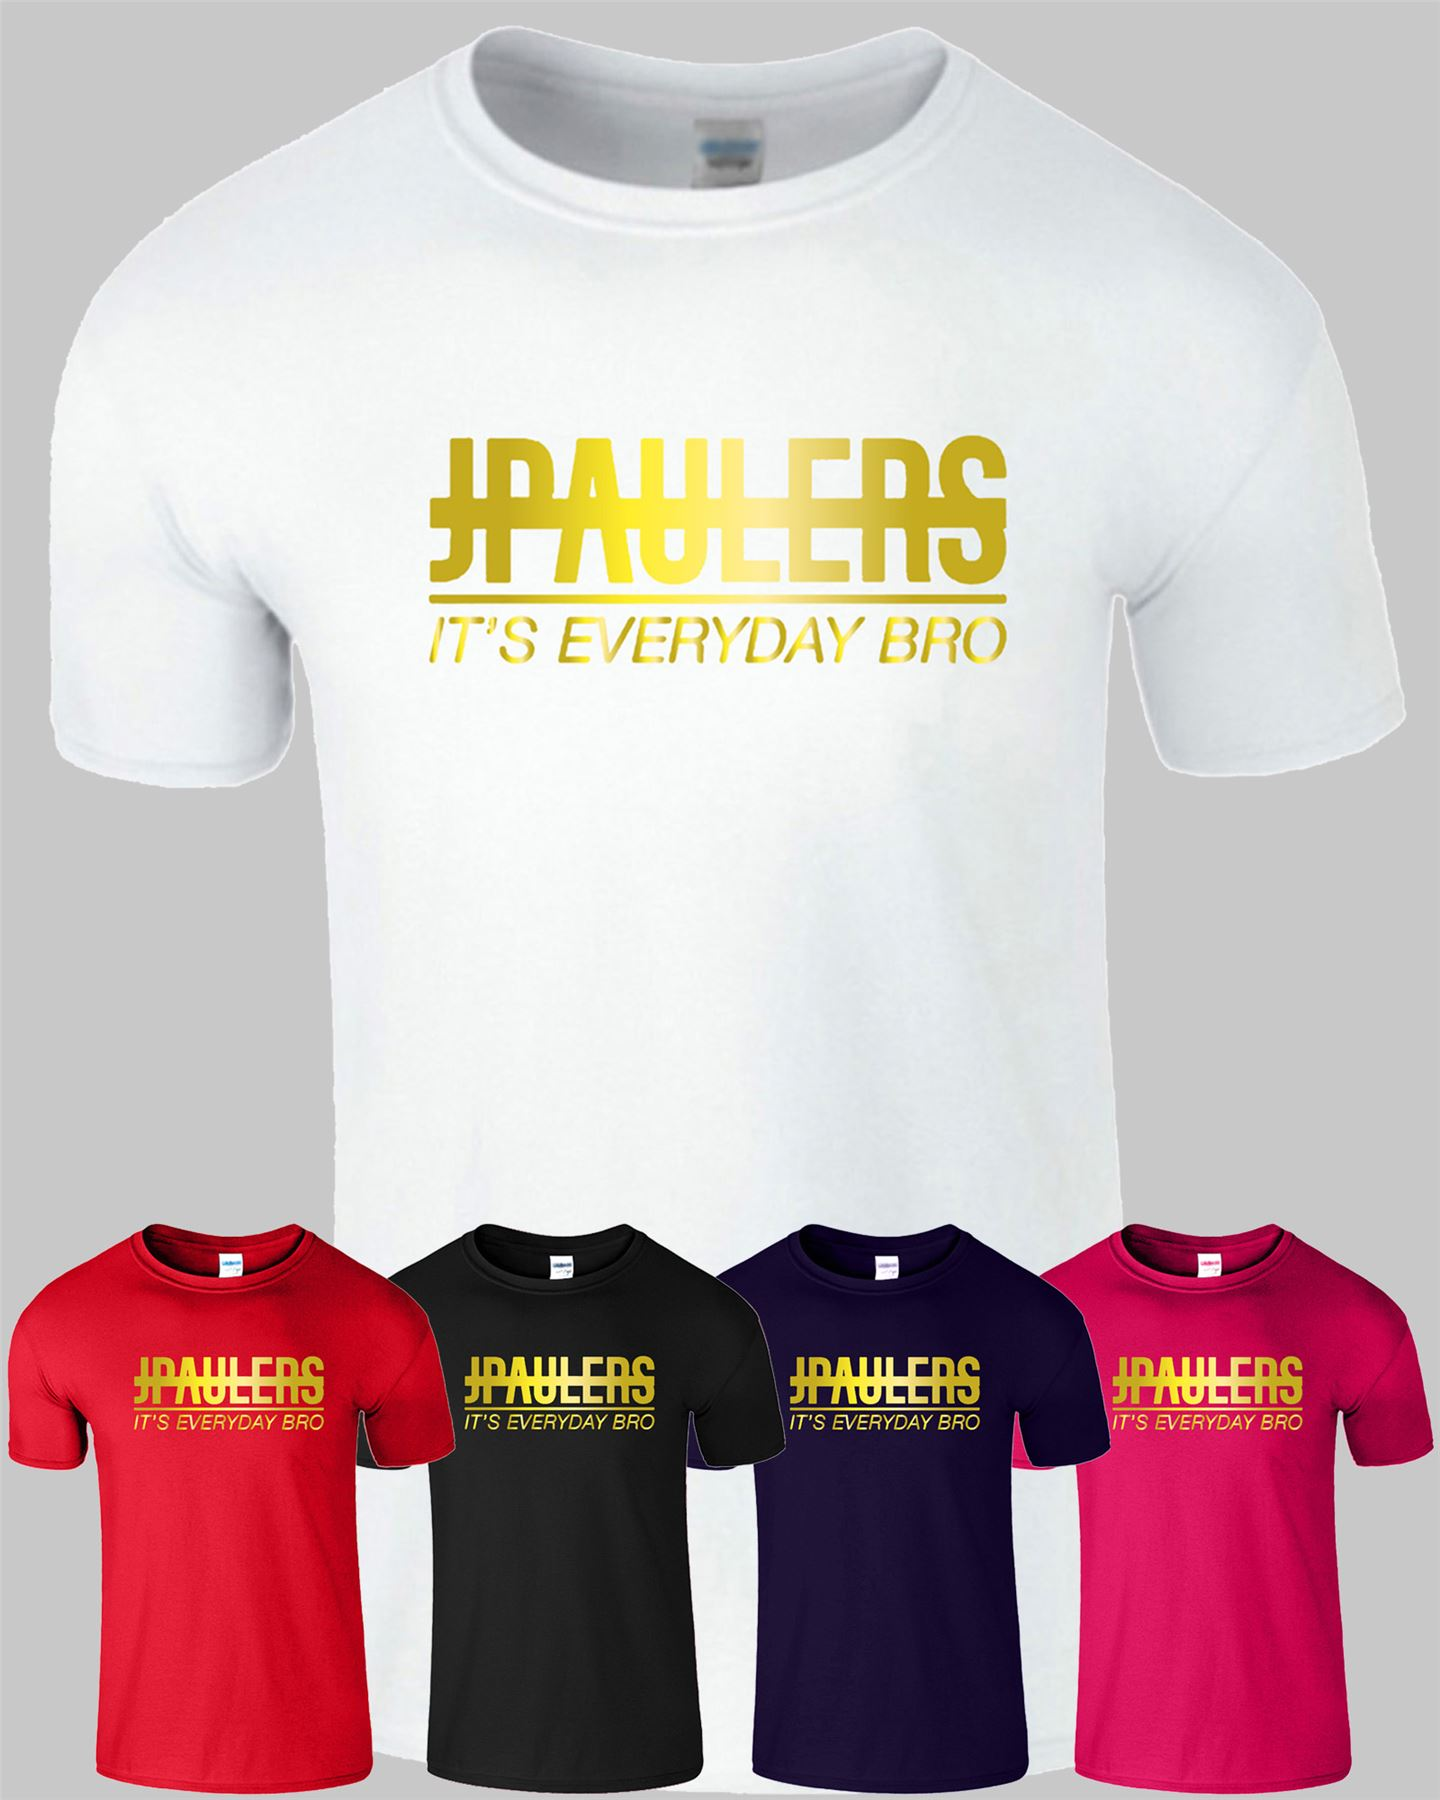 JPAULERS ITS EVERYDAY BRO Kids Boys T Shirt Youtuber Mens Women JP T-Shirt Tee